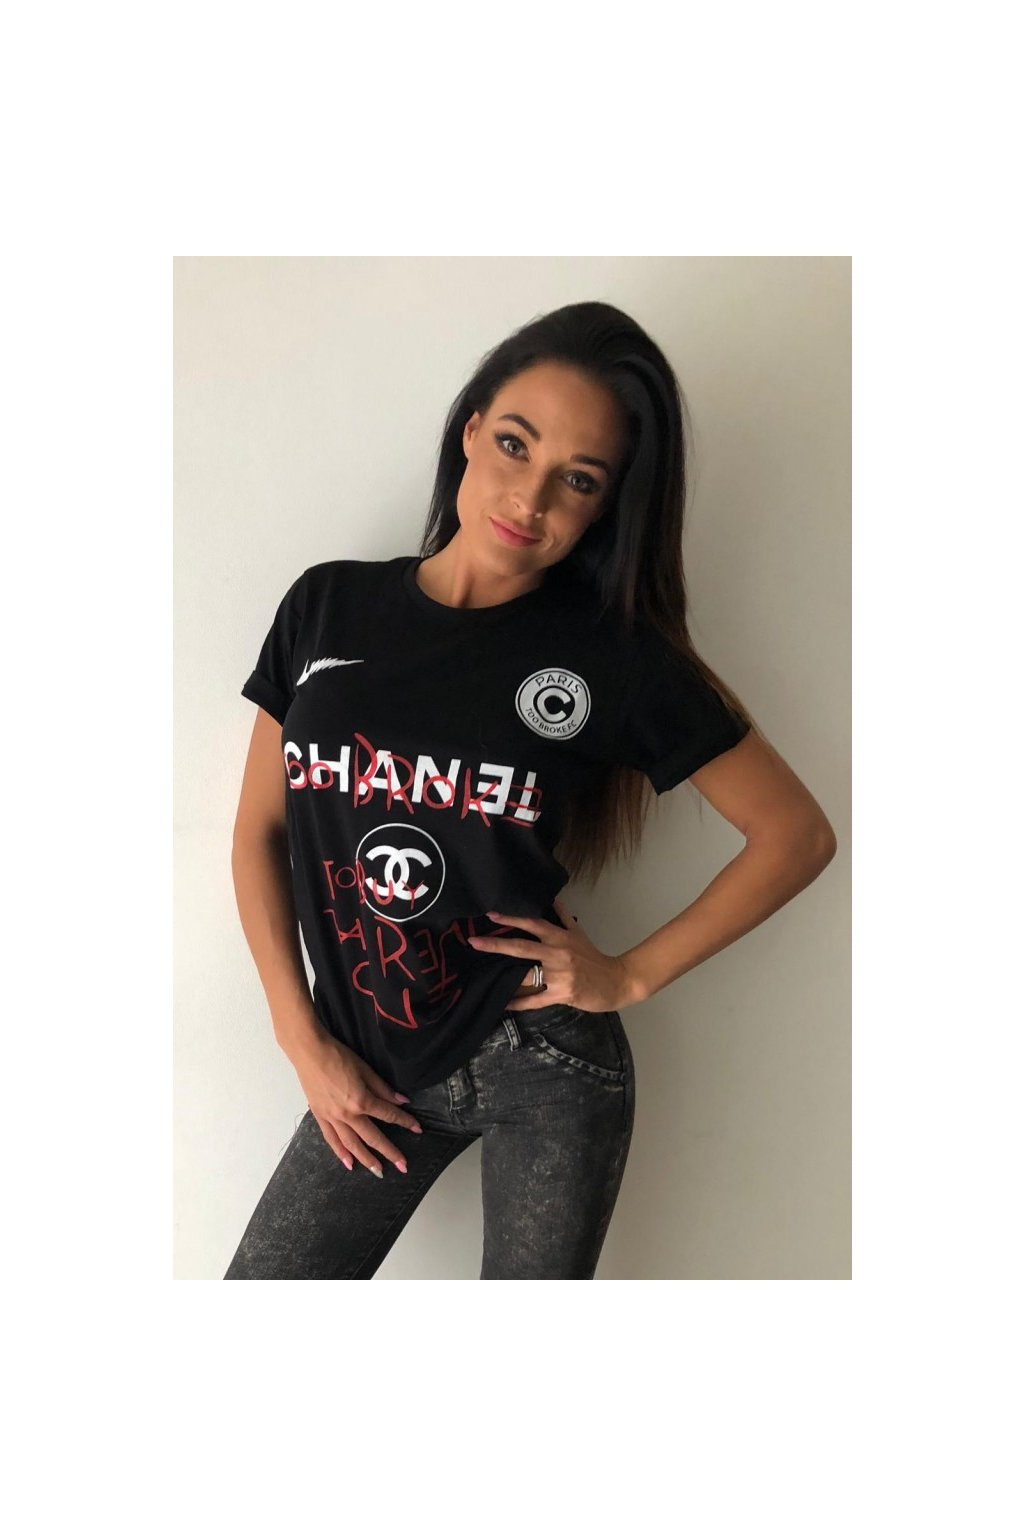 Tričko TooBroke s nápisem Chanel - černé (Velikost Velikost L)